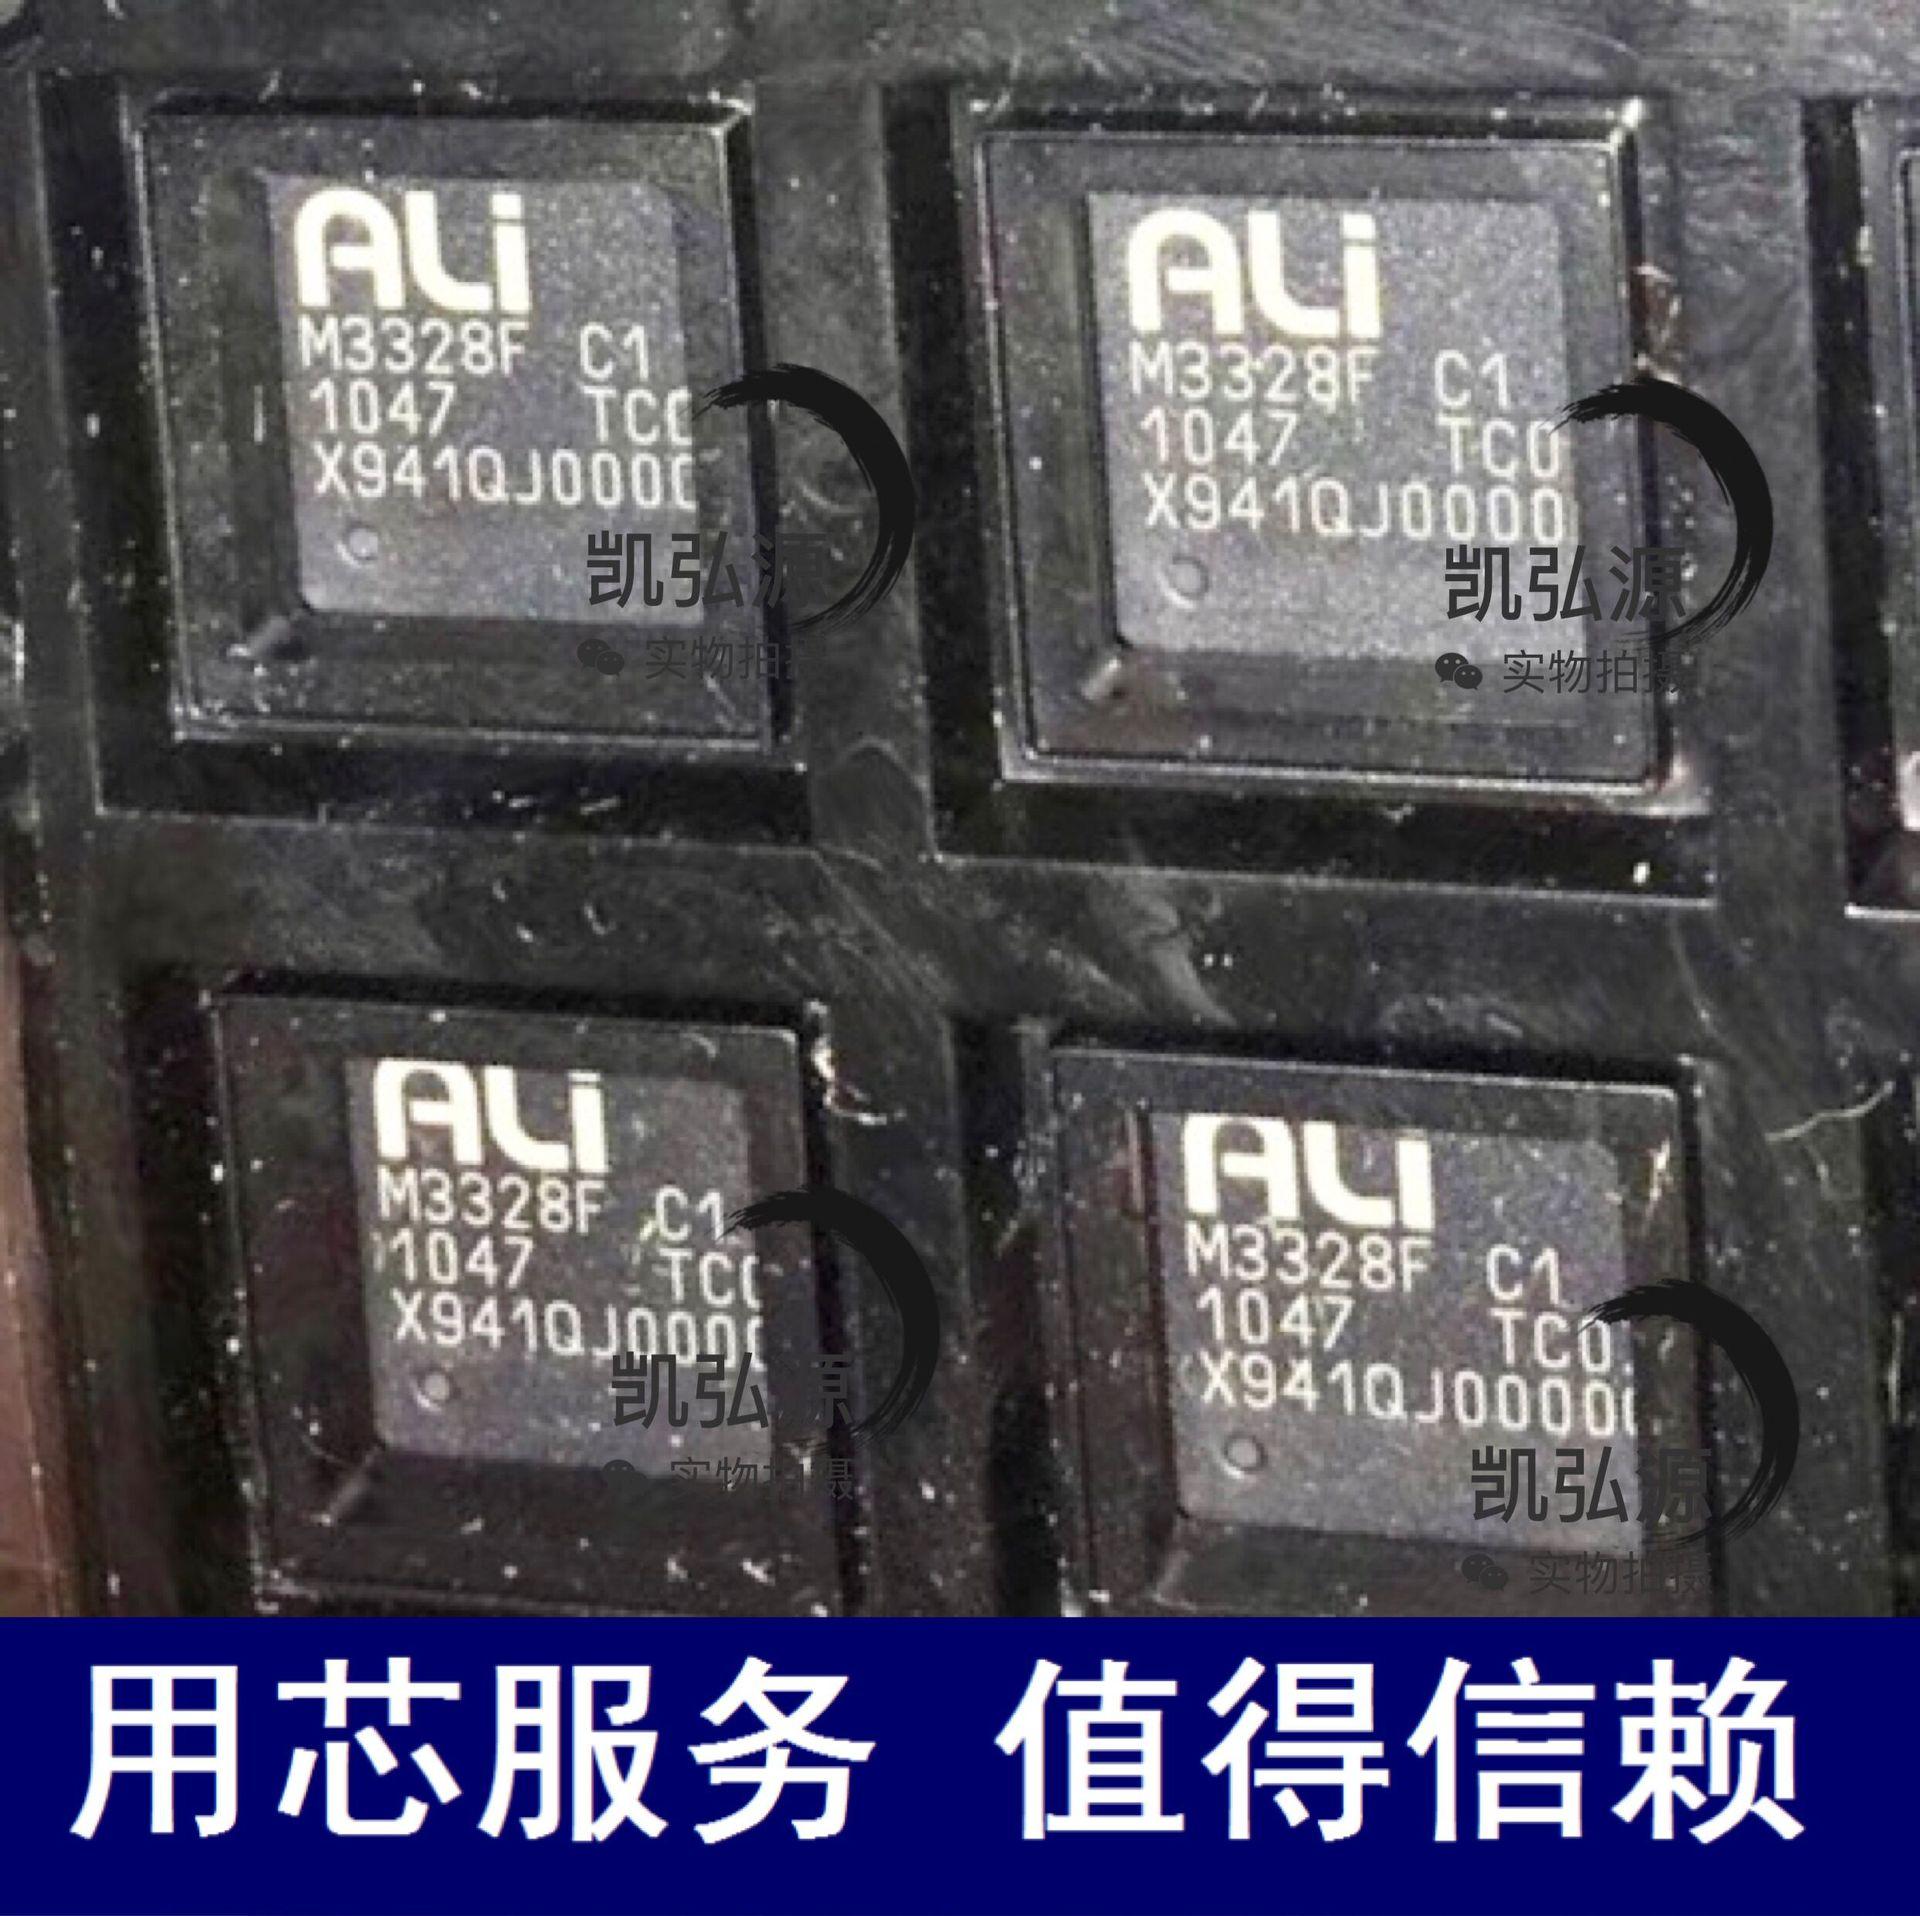 M3328F控制板辅助芯片 一站式BOM表配料 提供技术支持